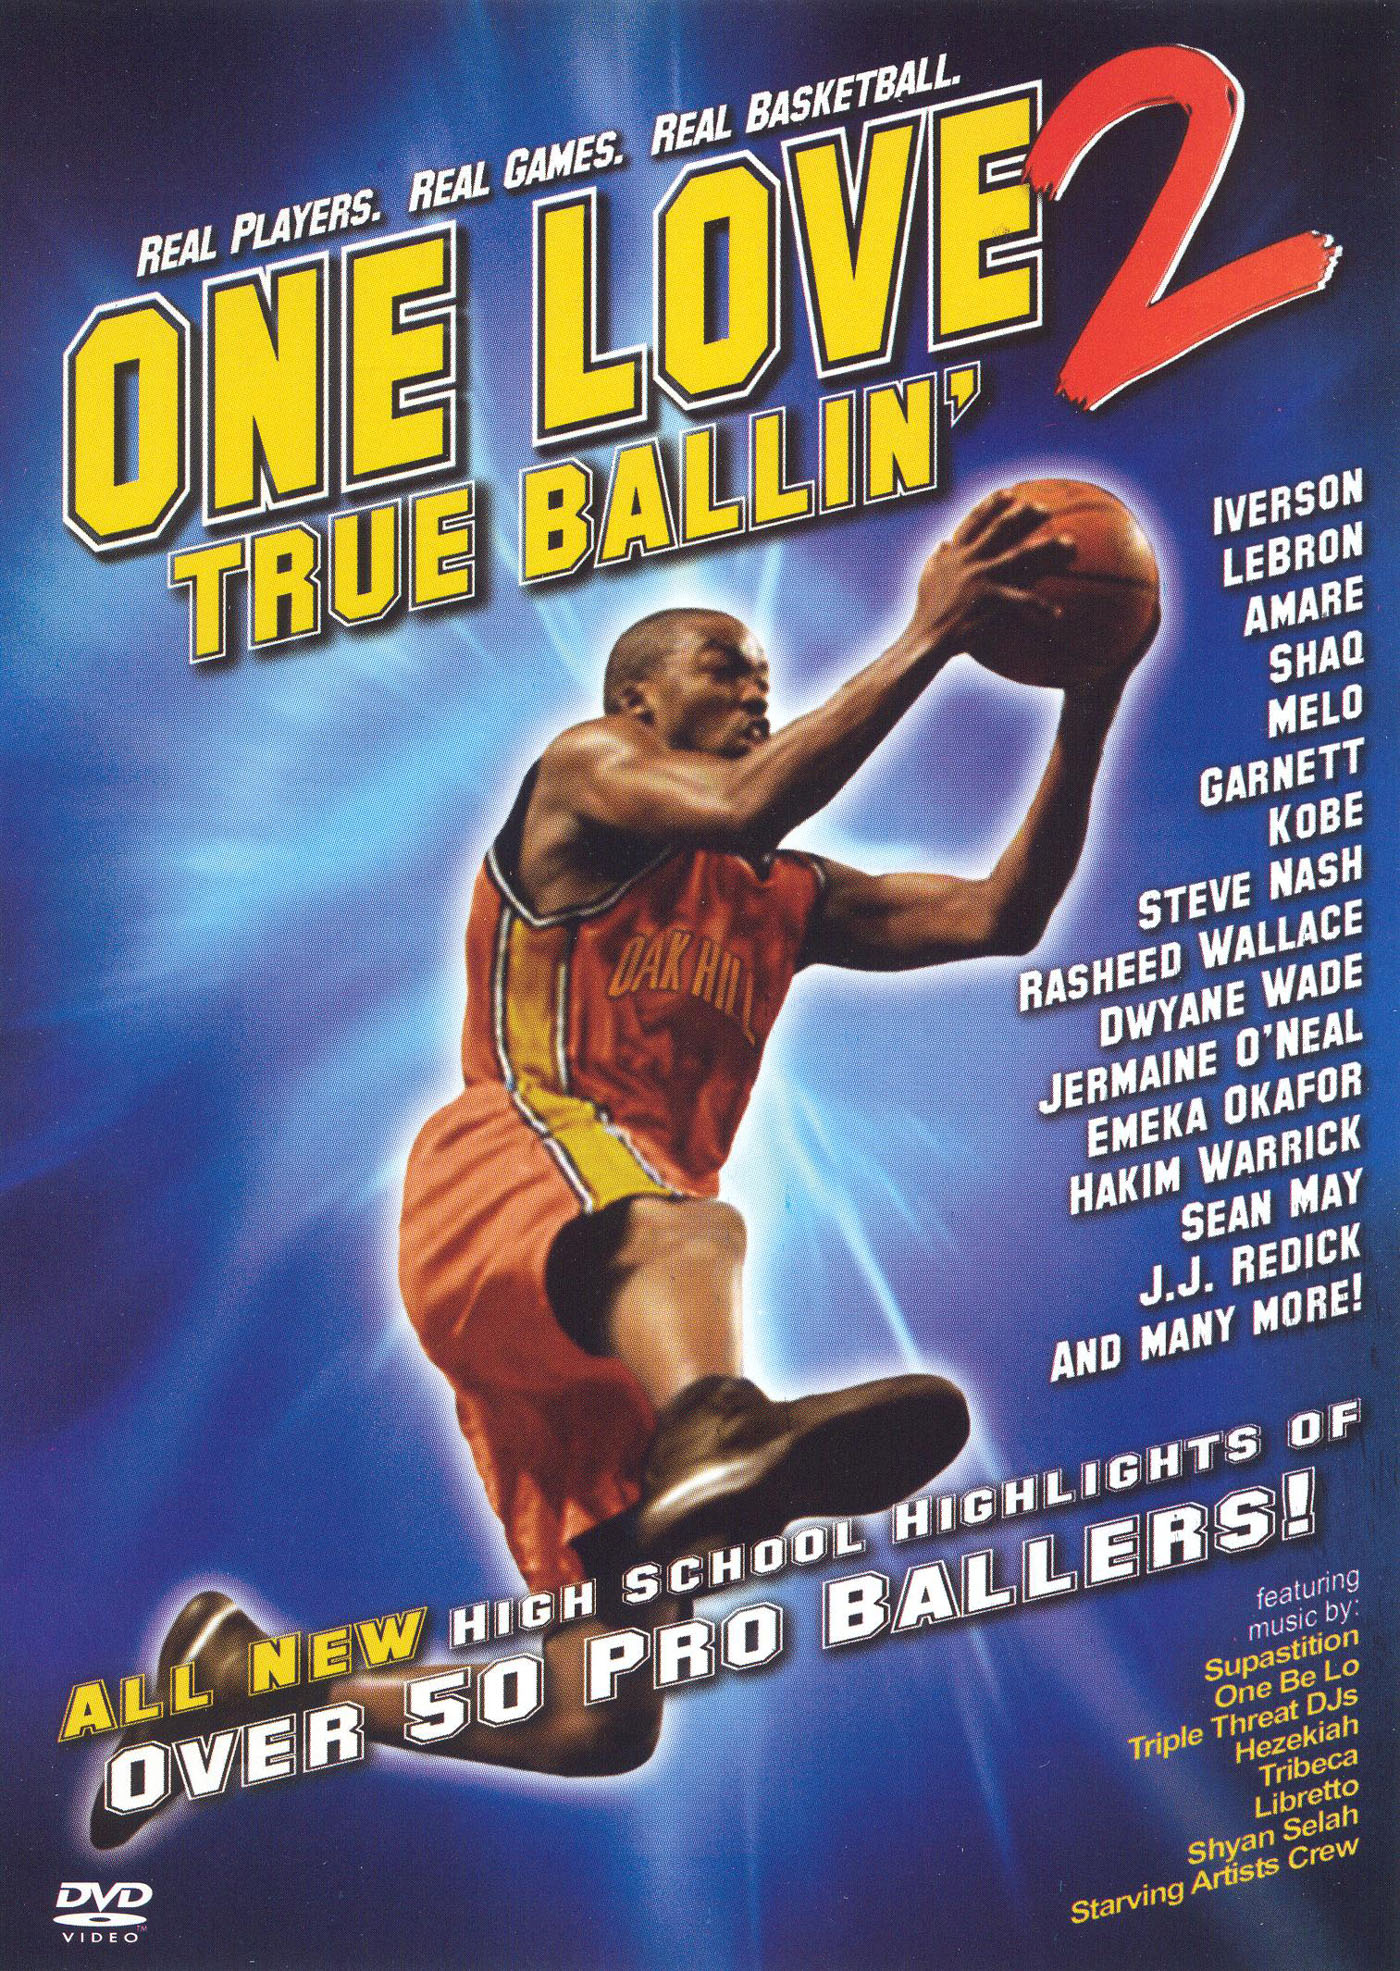 One Love, Vol. 2: True Ballin'